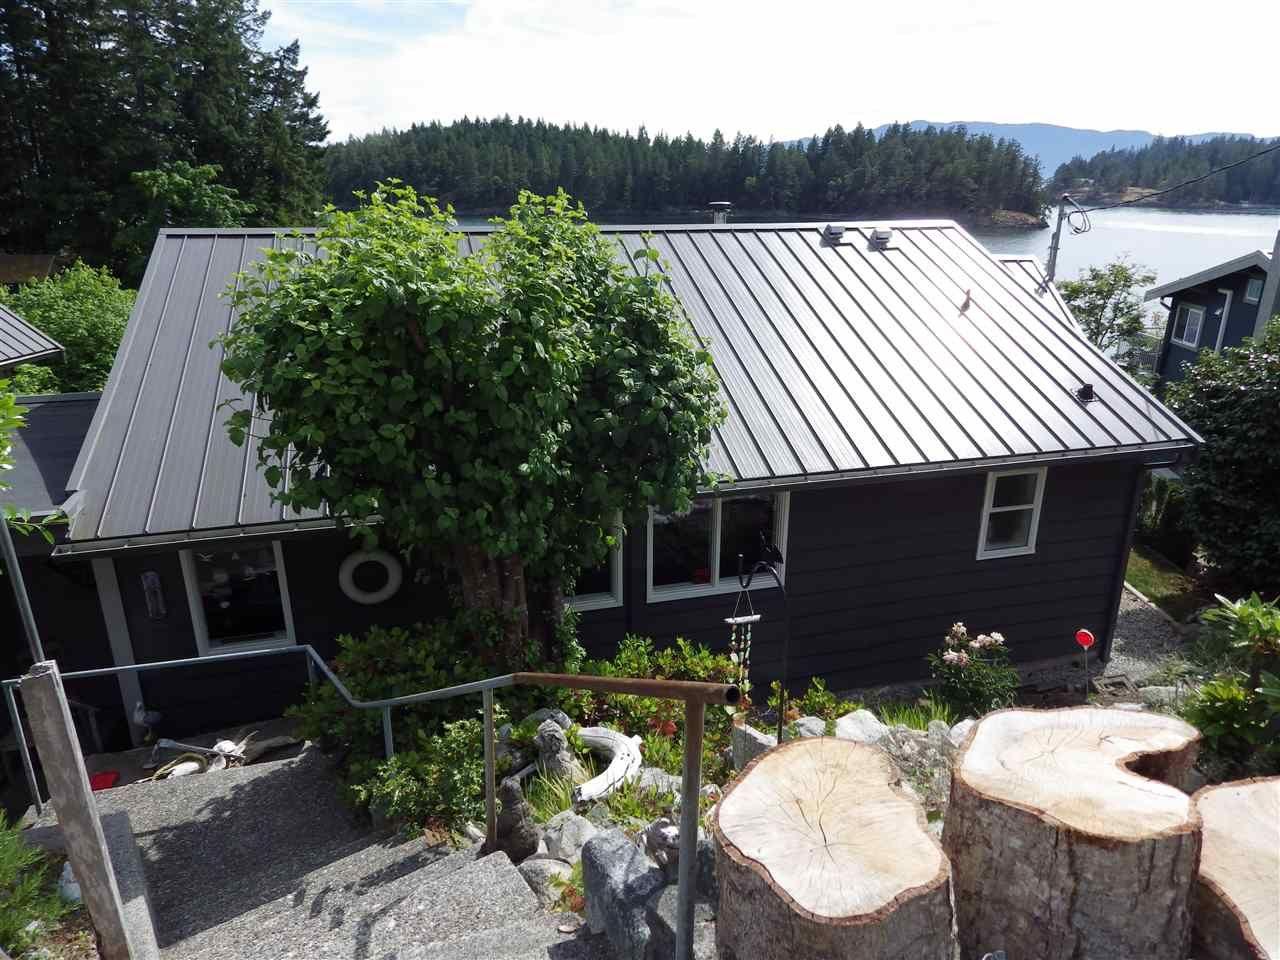 Main Photo: 4988 MARK Way in Pender Harbour: Pender Harbour Egmont House for sale (Sunshine Coast)  : MLS®# R2381122